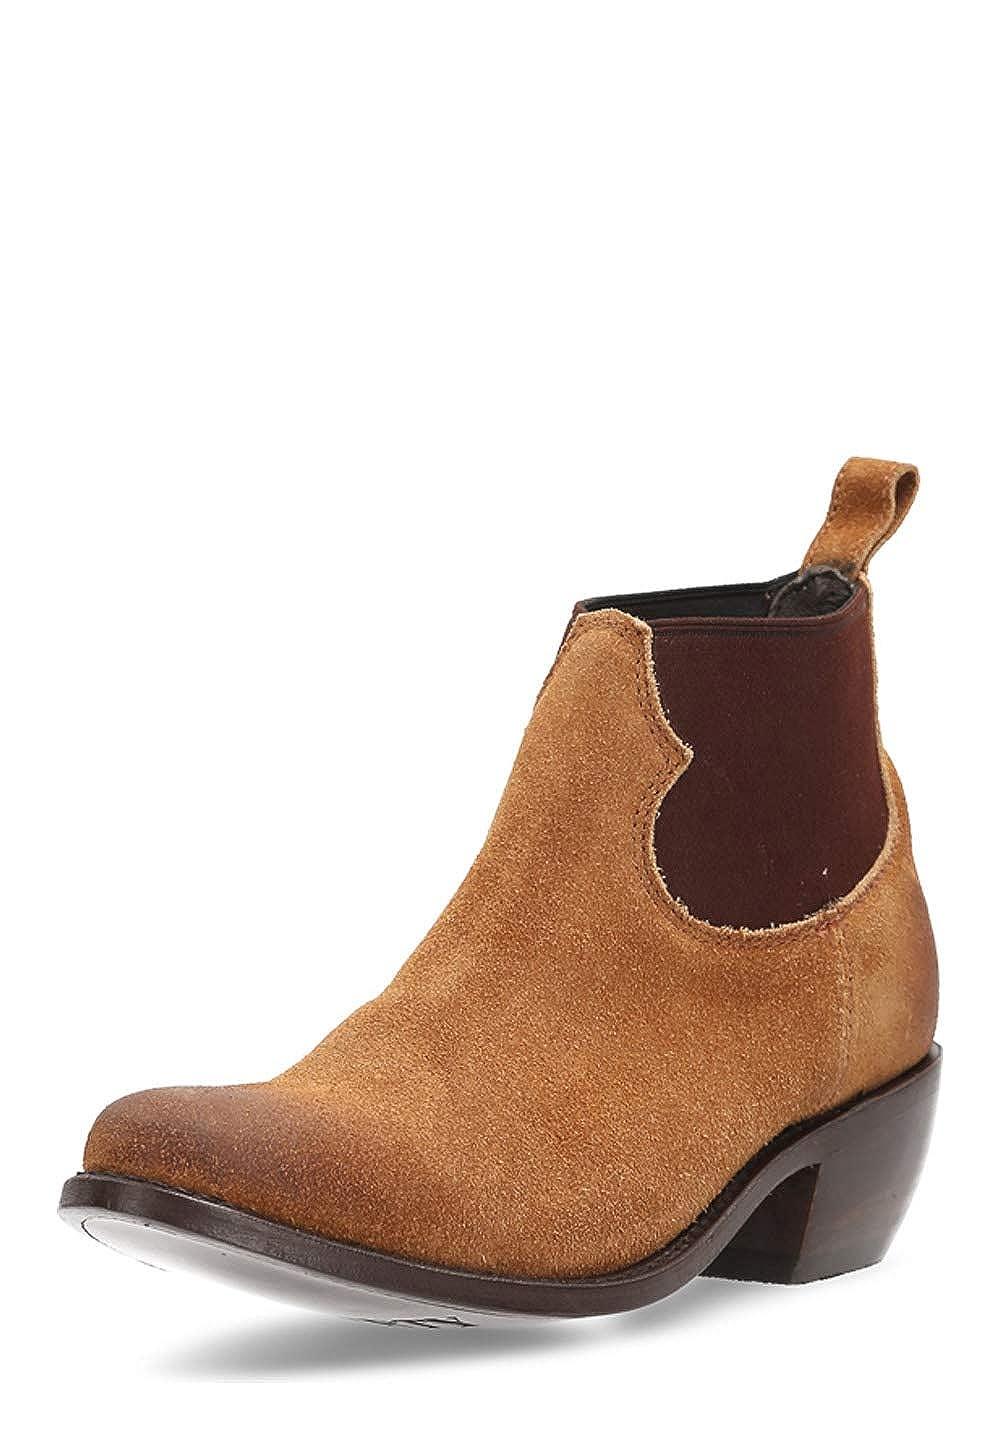 Liberty schwarz Damen Ankle Stiefel Thea Gamuza Leder Absatz 5 cm